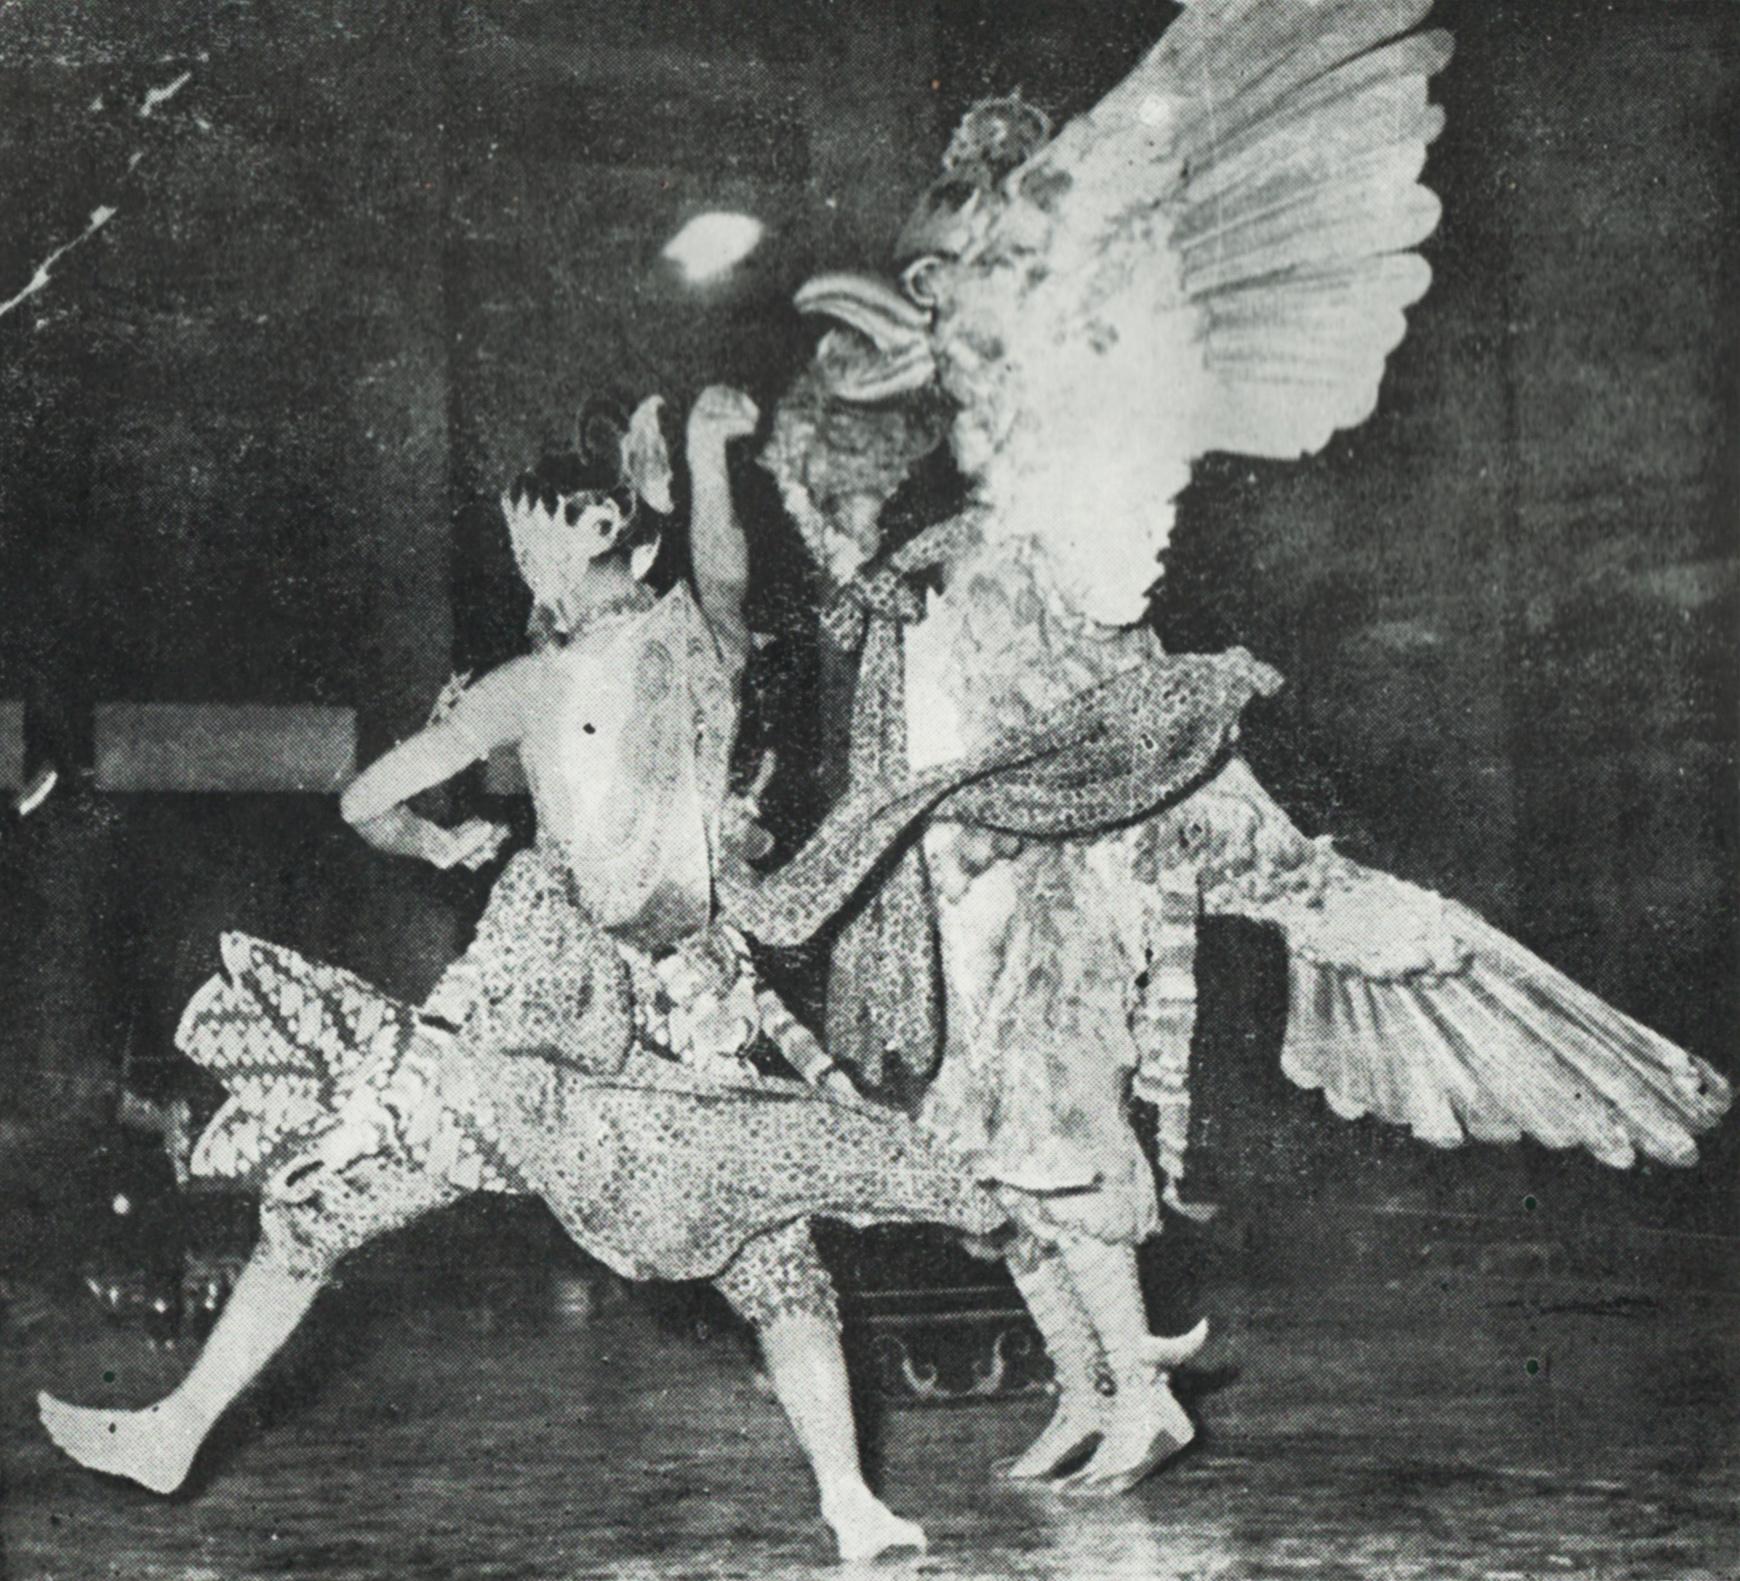 File Gatotkaca Fighting Garodayeksa Wayang Orang Yogyakarta Credited To Budaya Kota Jogjakarta 200 Tahun Plate Before Page 153 Jpg Wikimedia Commons